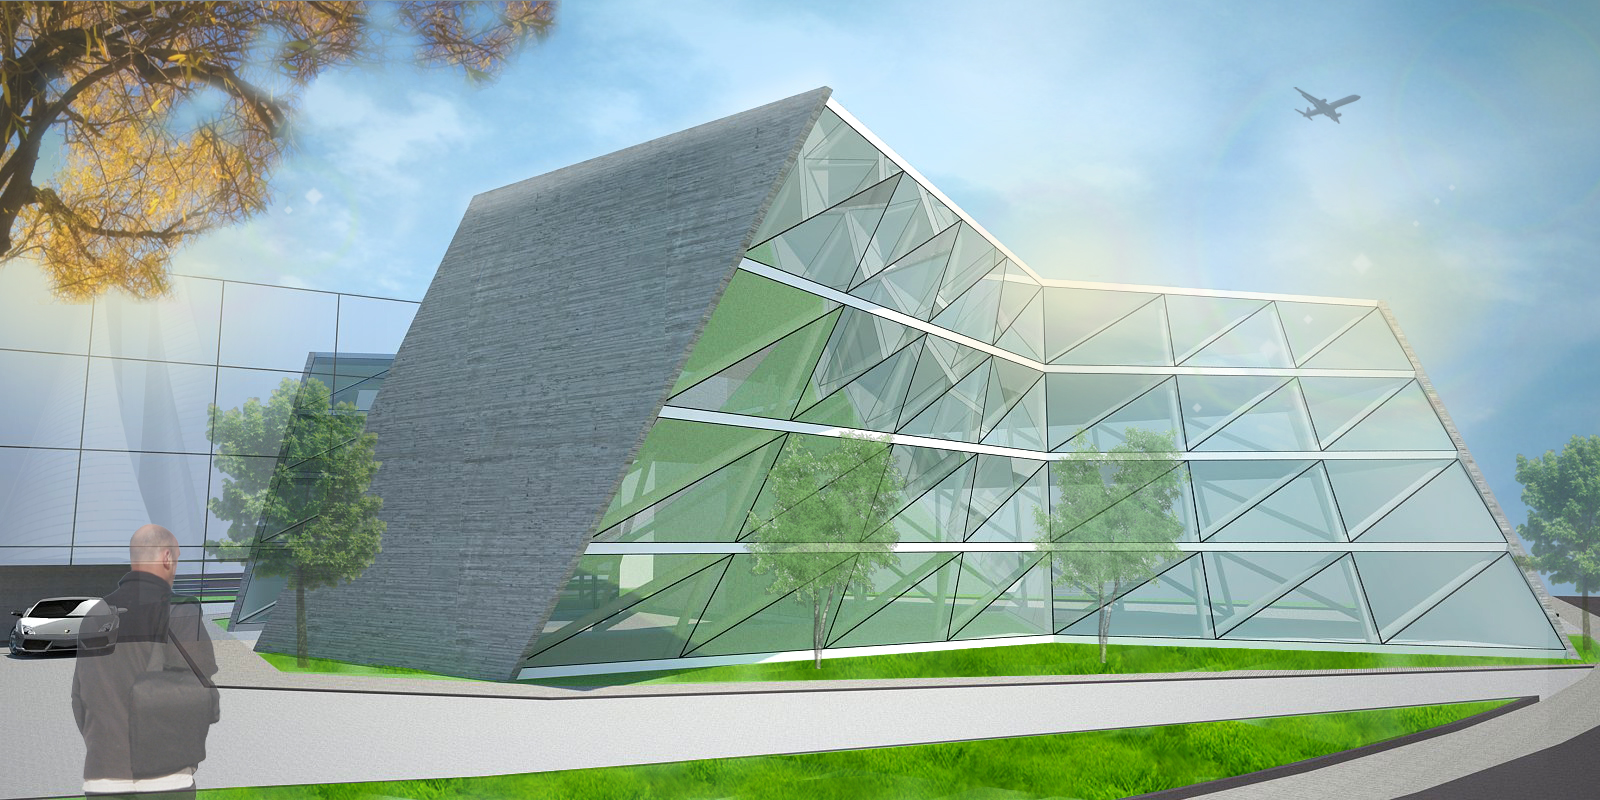 S.S.C. building